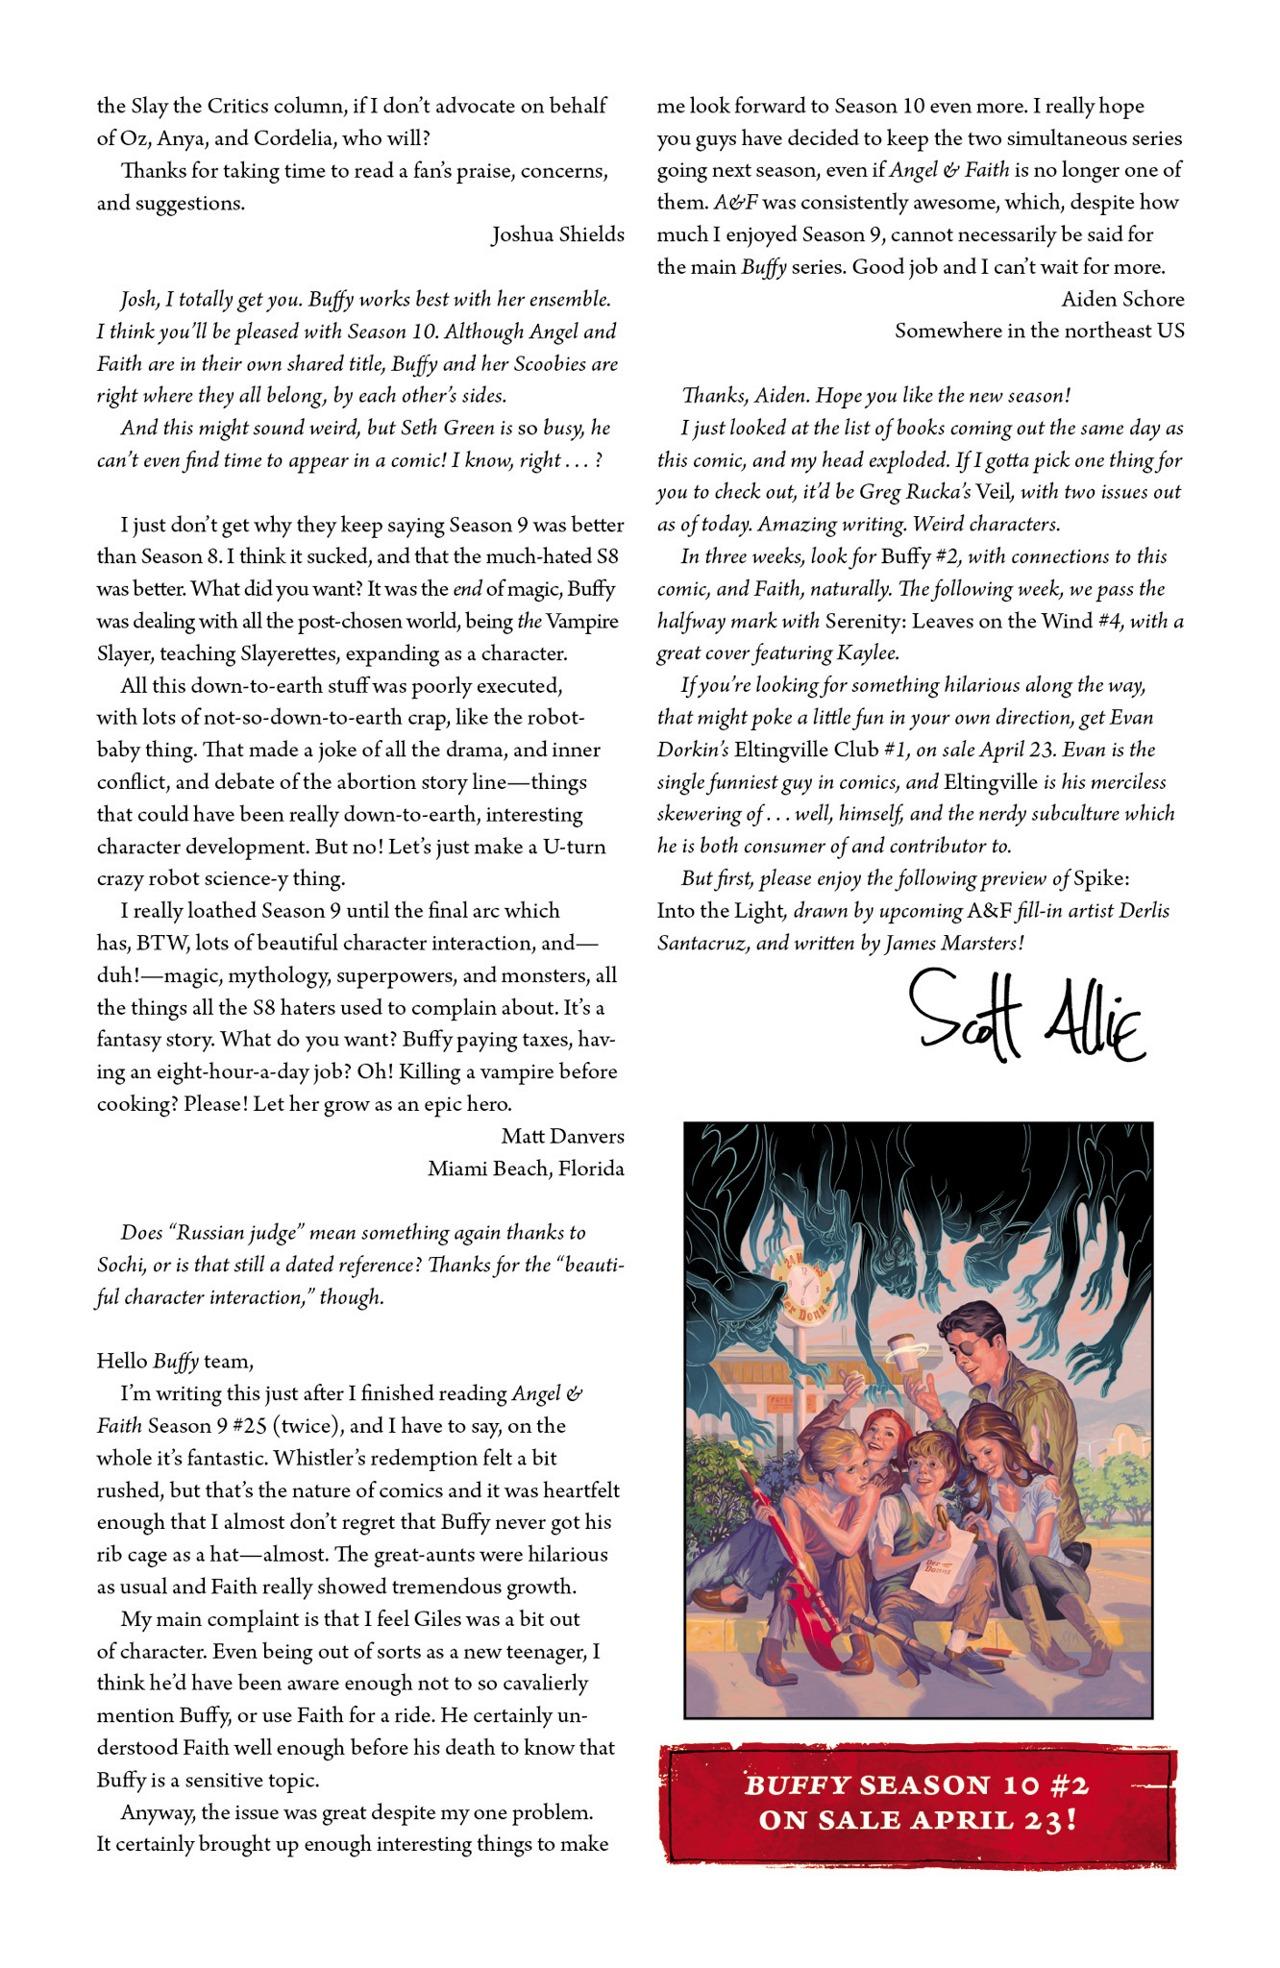 Read online Angel & Faith Season 10 comic -  Issue #1 - 26